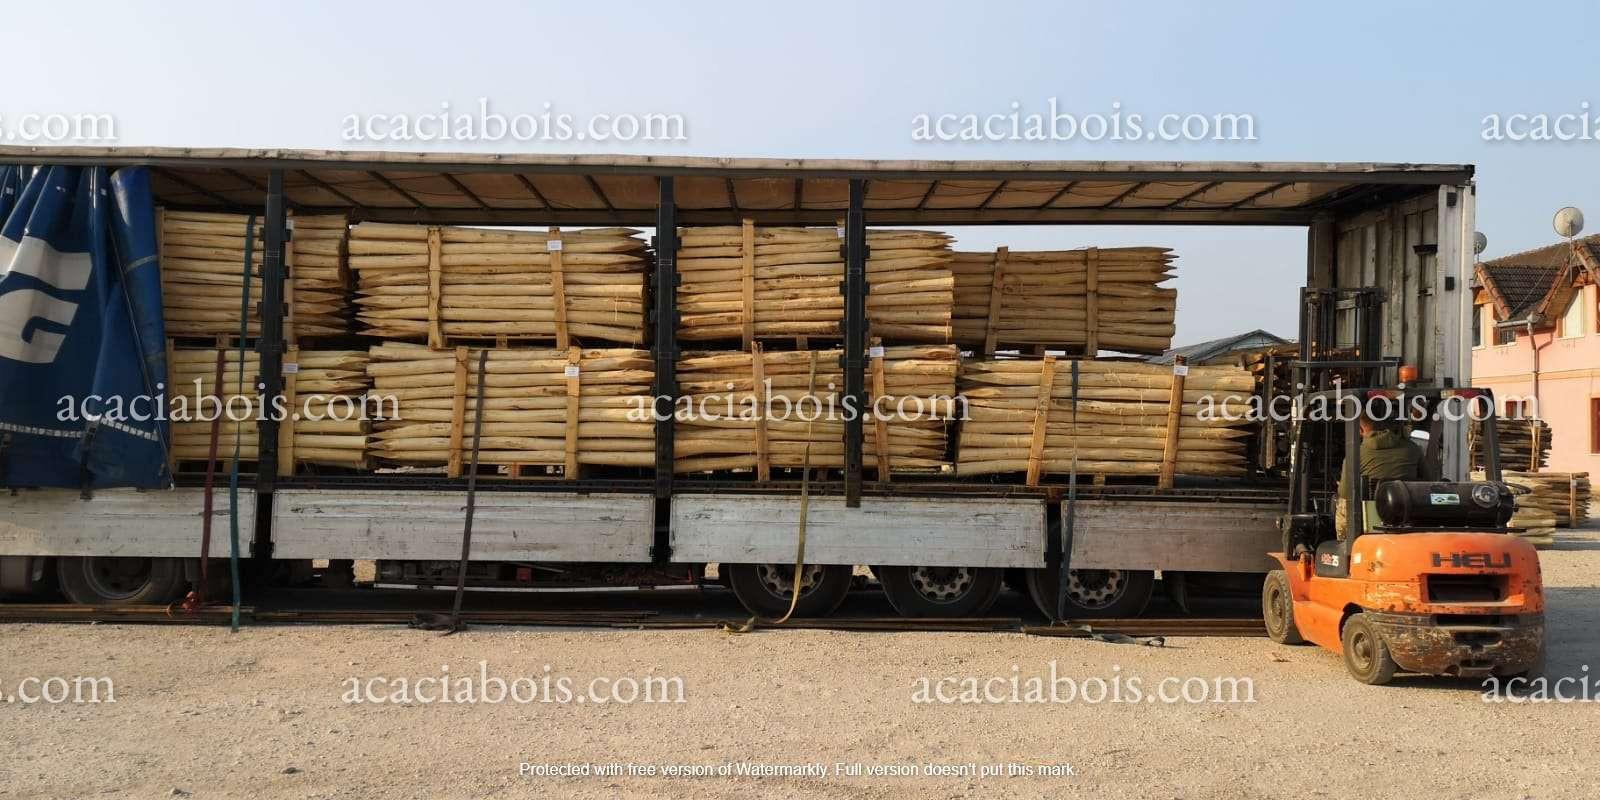 Camion_piquets_acacia_ronds (2).jpg